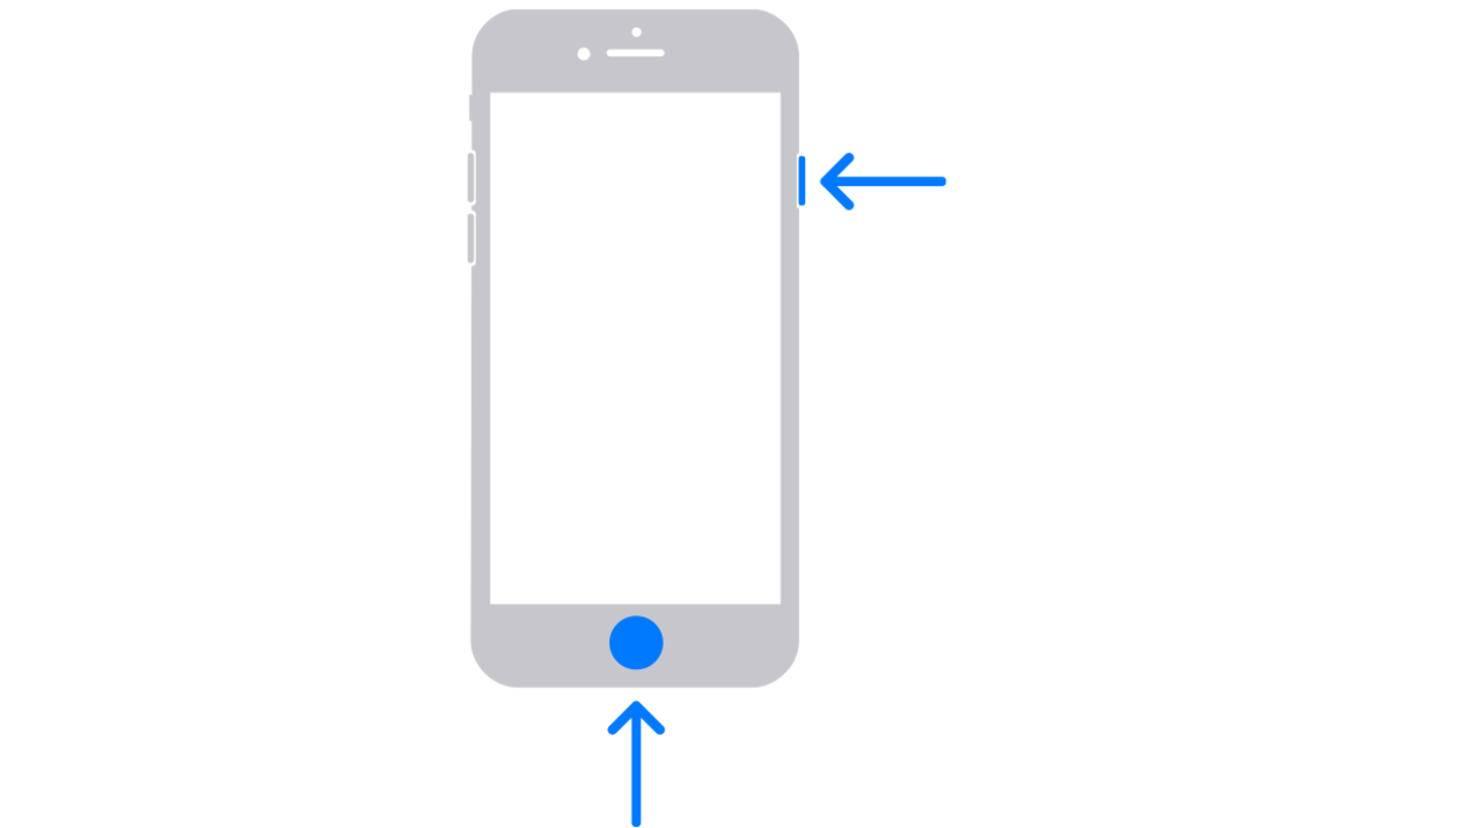 iPhone mit Home-Button Screenshot